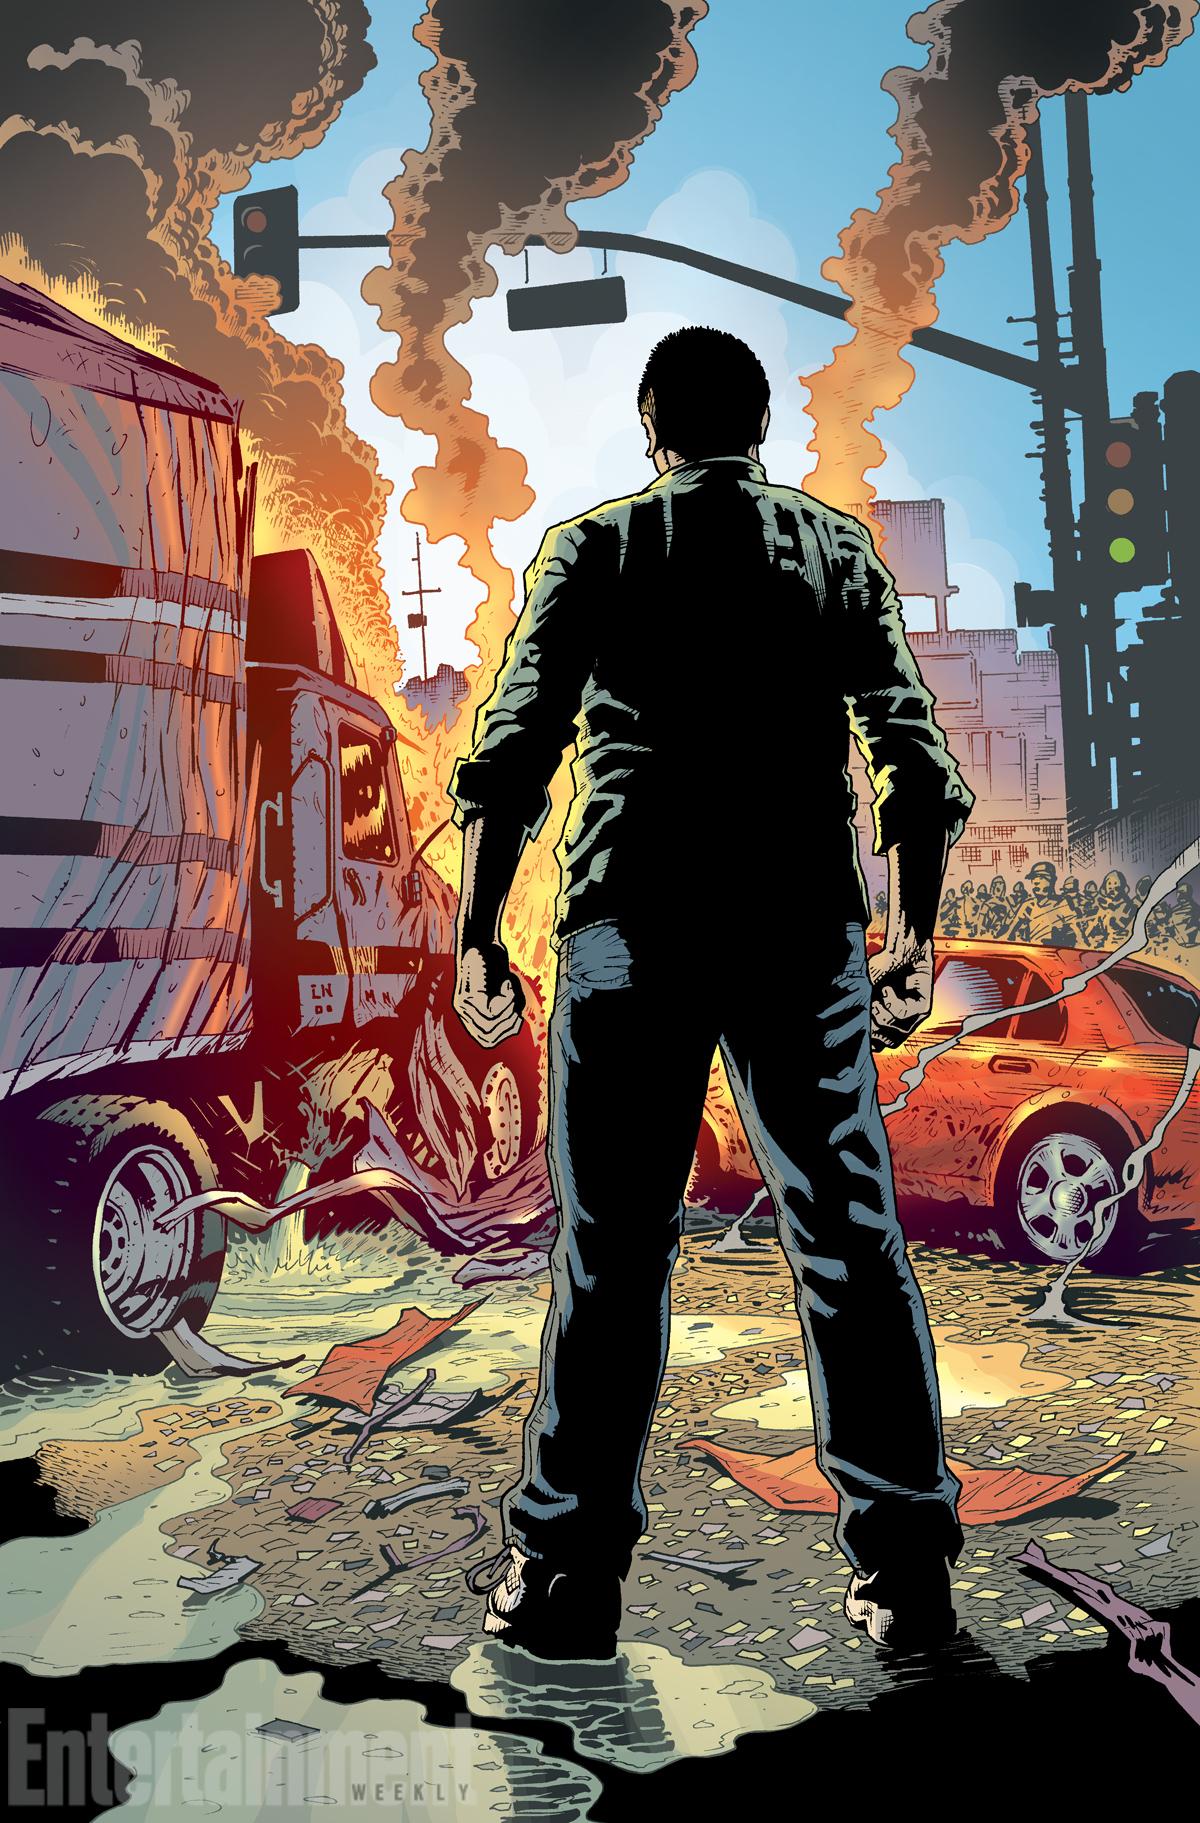 sdcc-070715-comics-jacked0102-09g